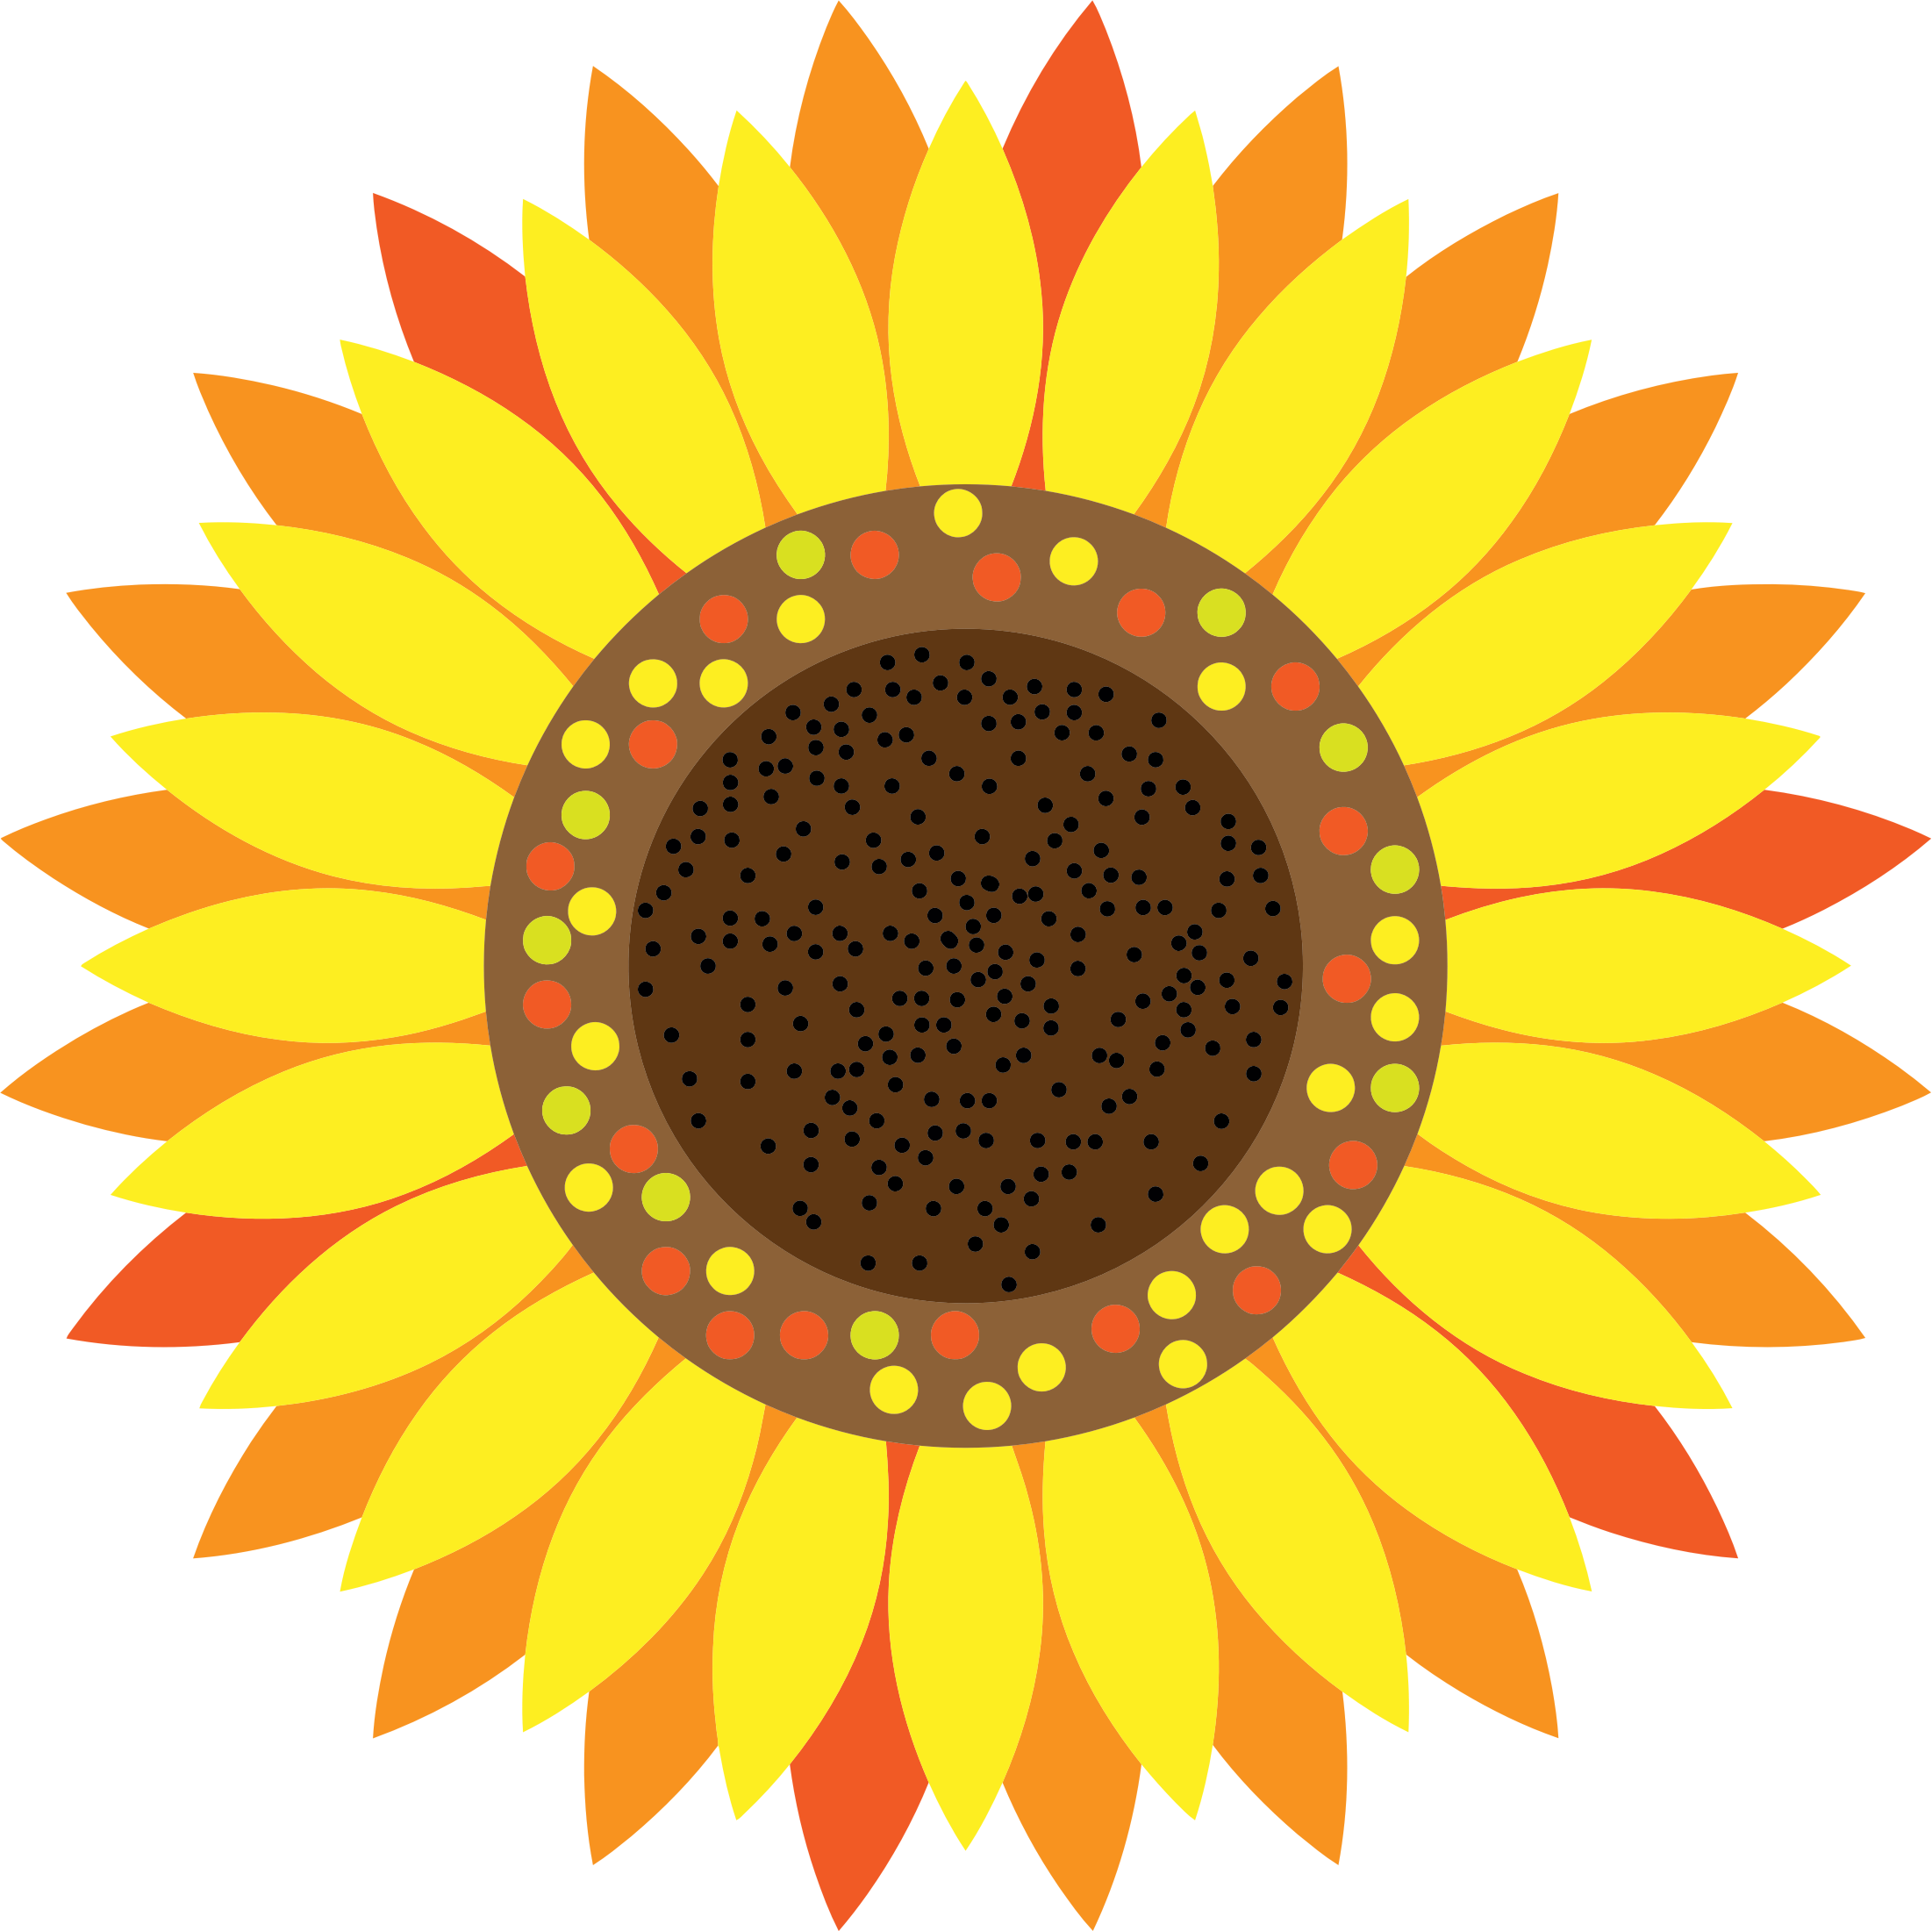 Sunflower Clipart Transparent